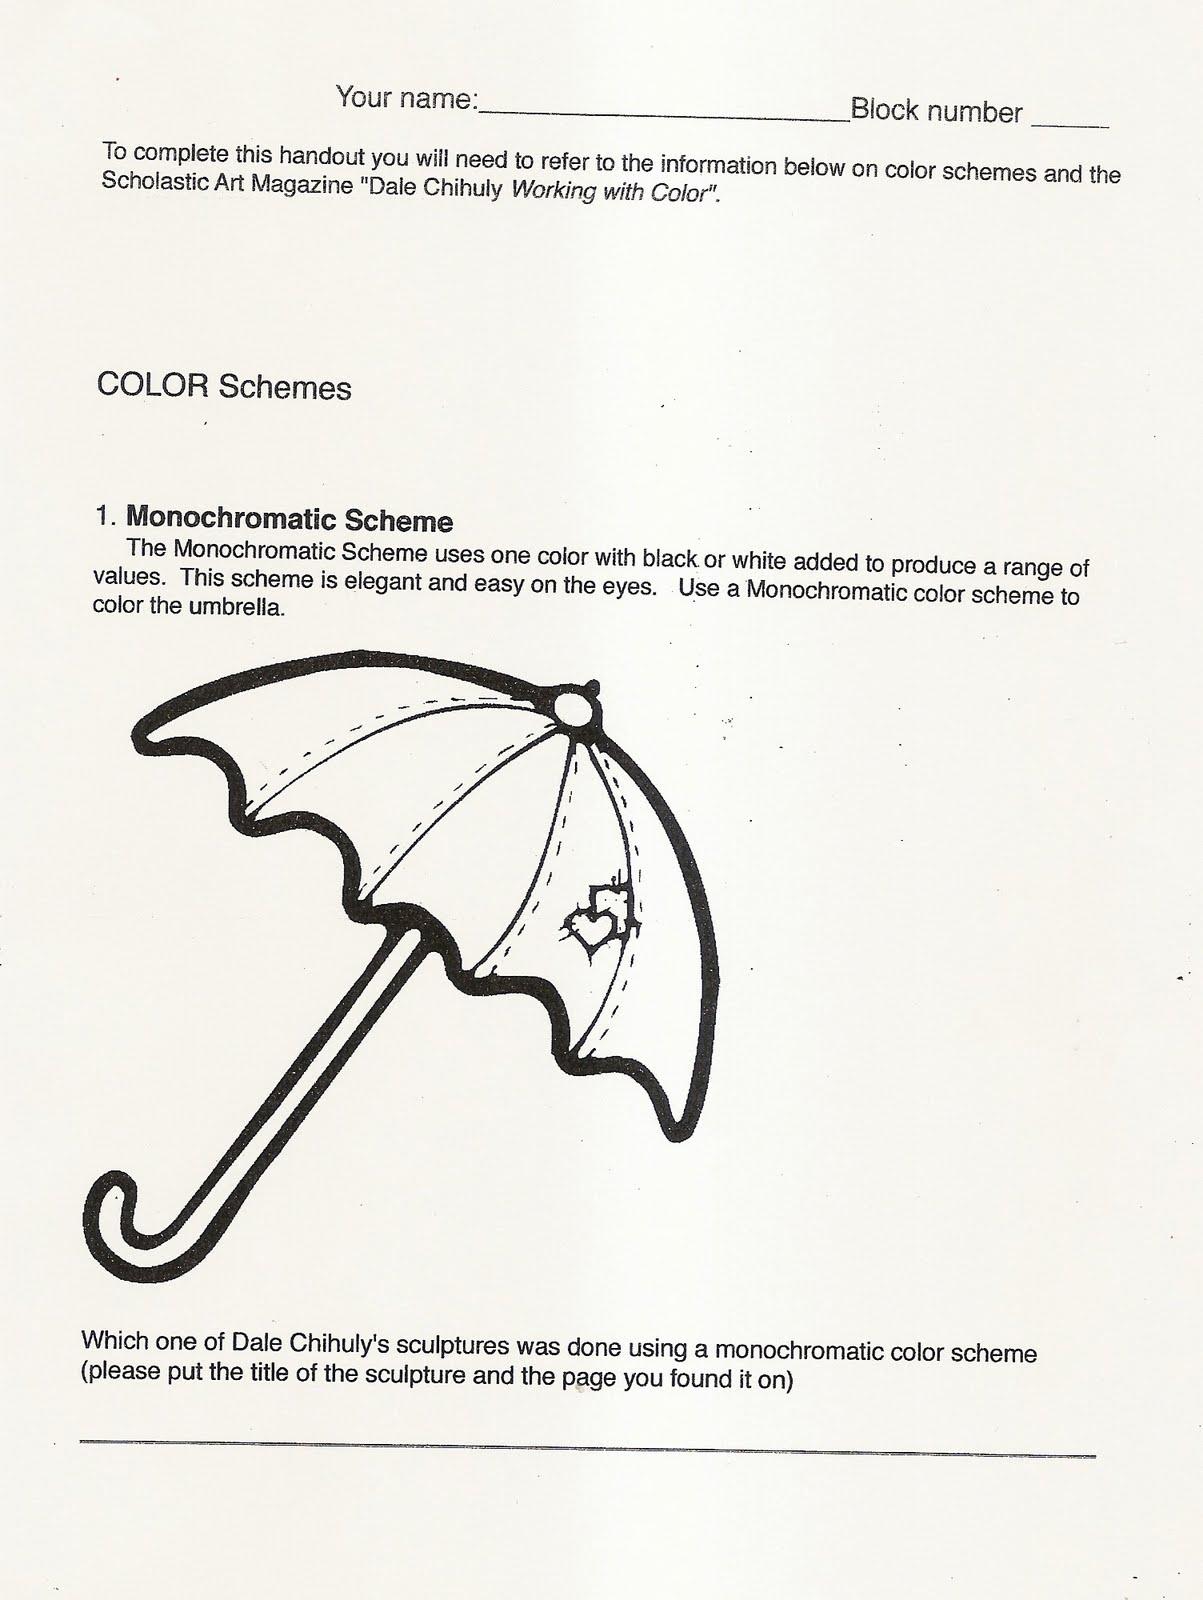 Handouts and worksheets: Color Schemes handout - November (Nov 1 - 5)